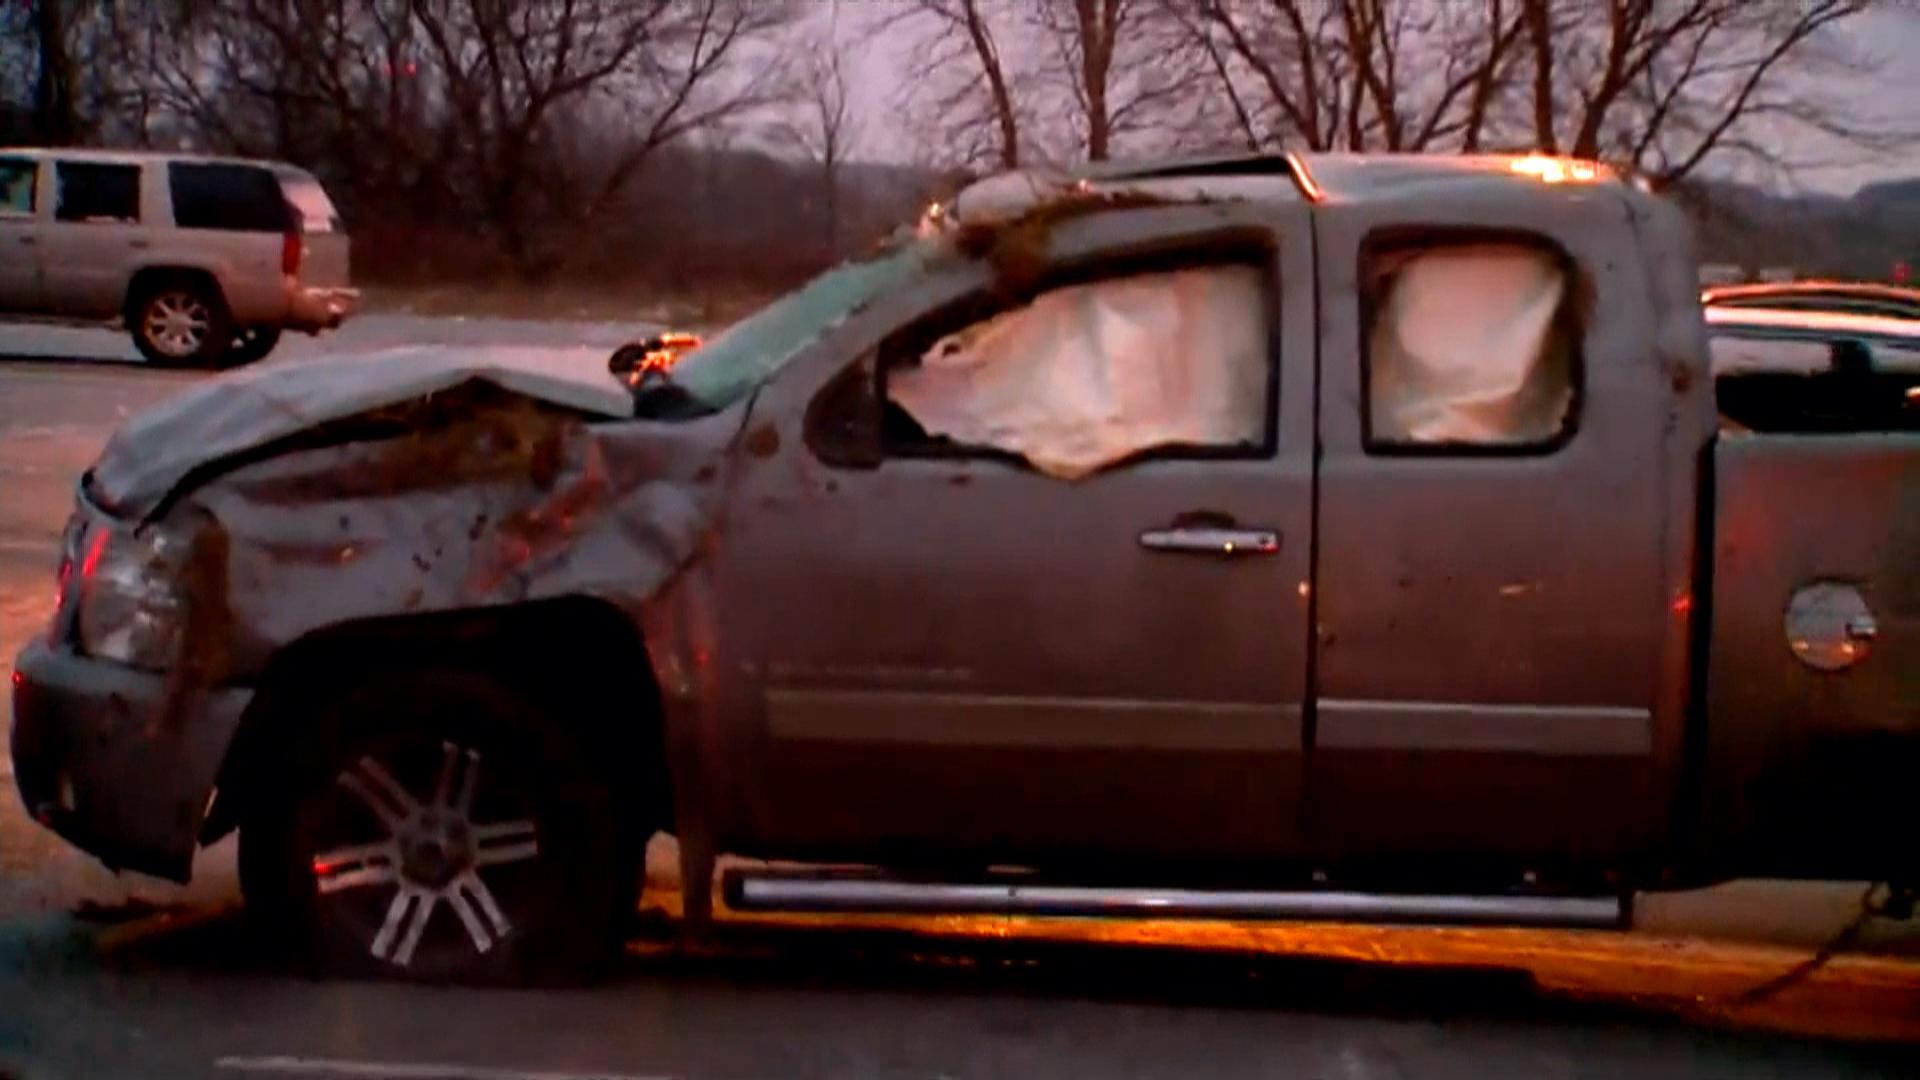 Dozens Crash on Icy Roads in Michigan - NBC News